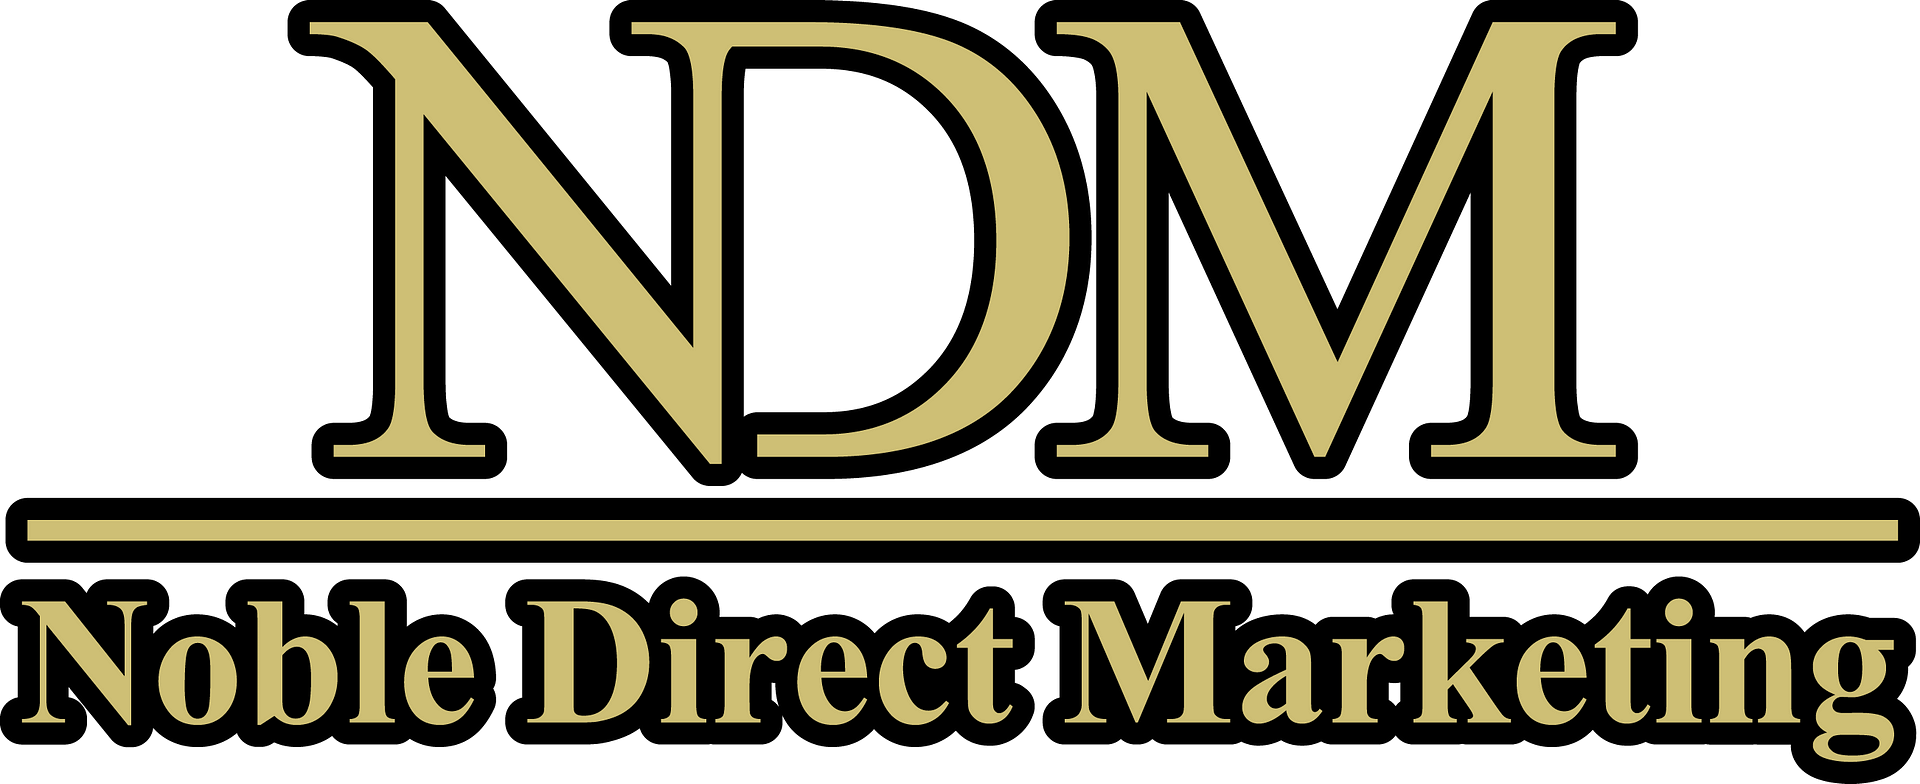 Noble Direct Marketing